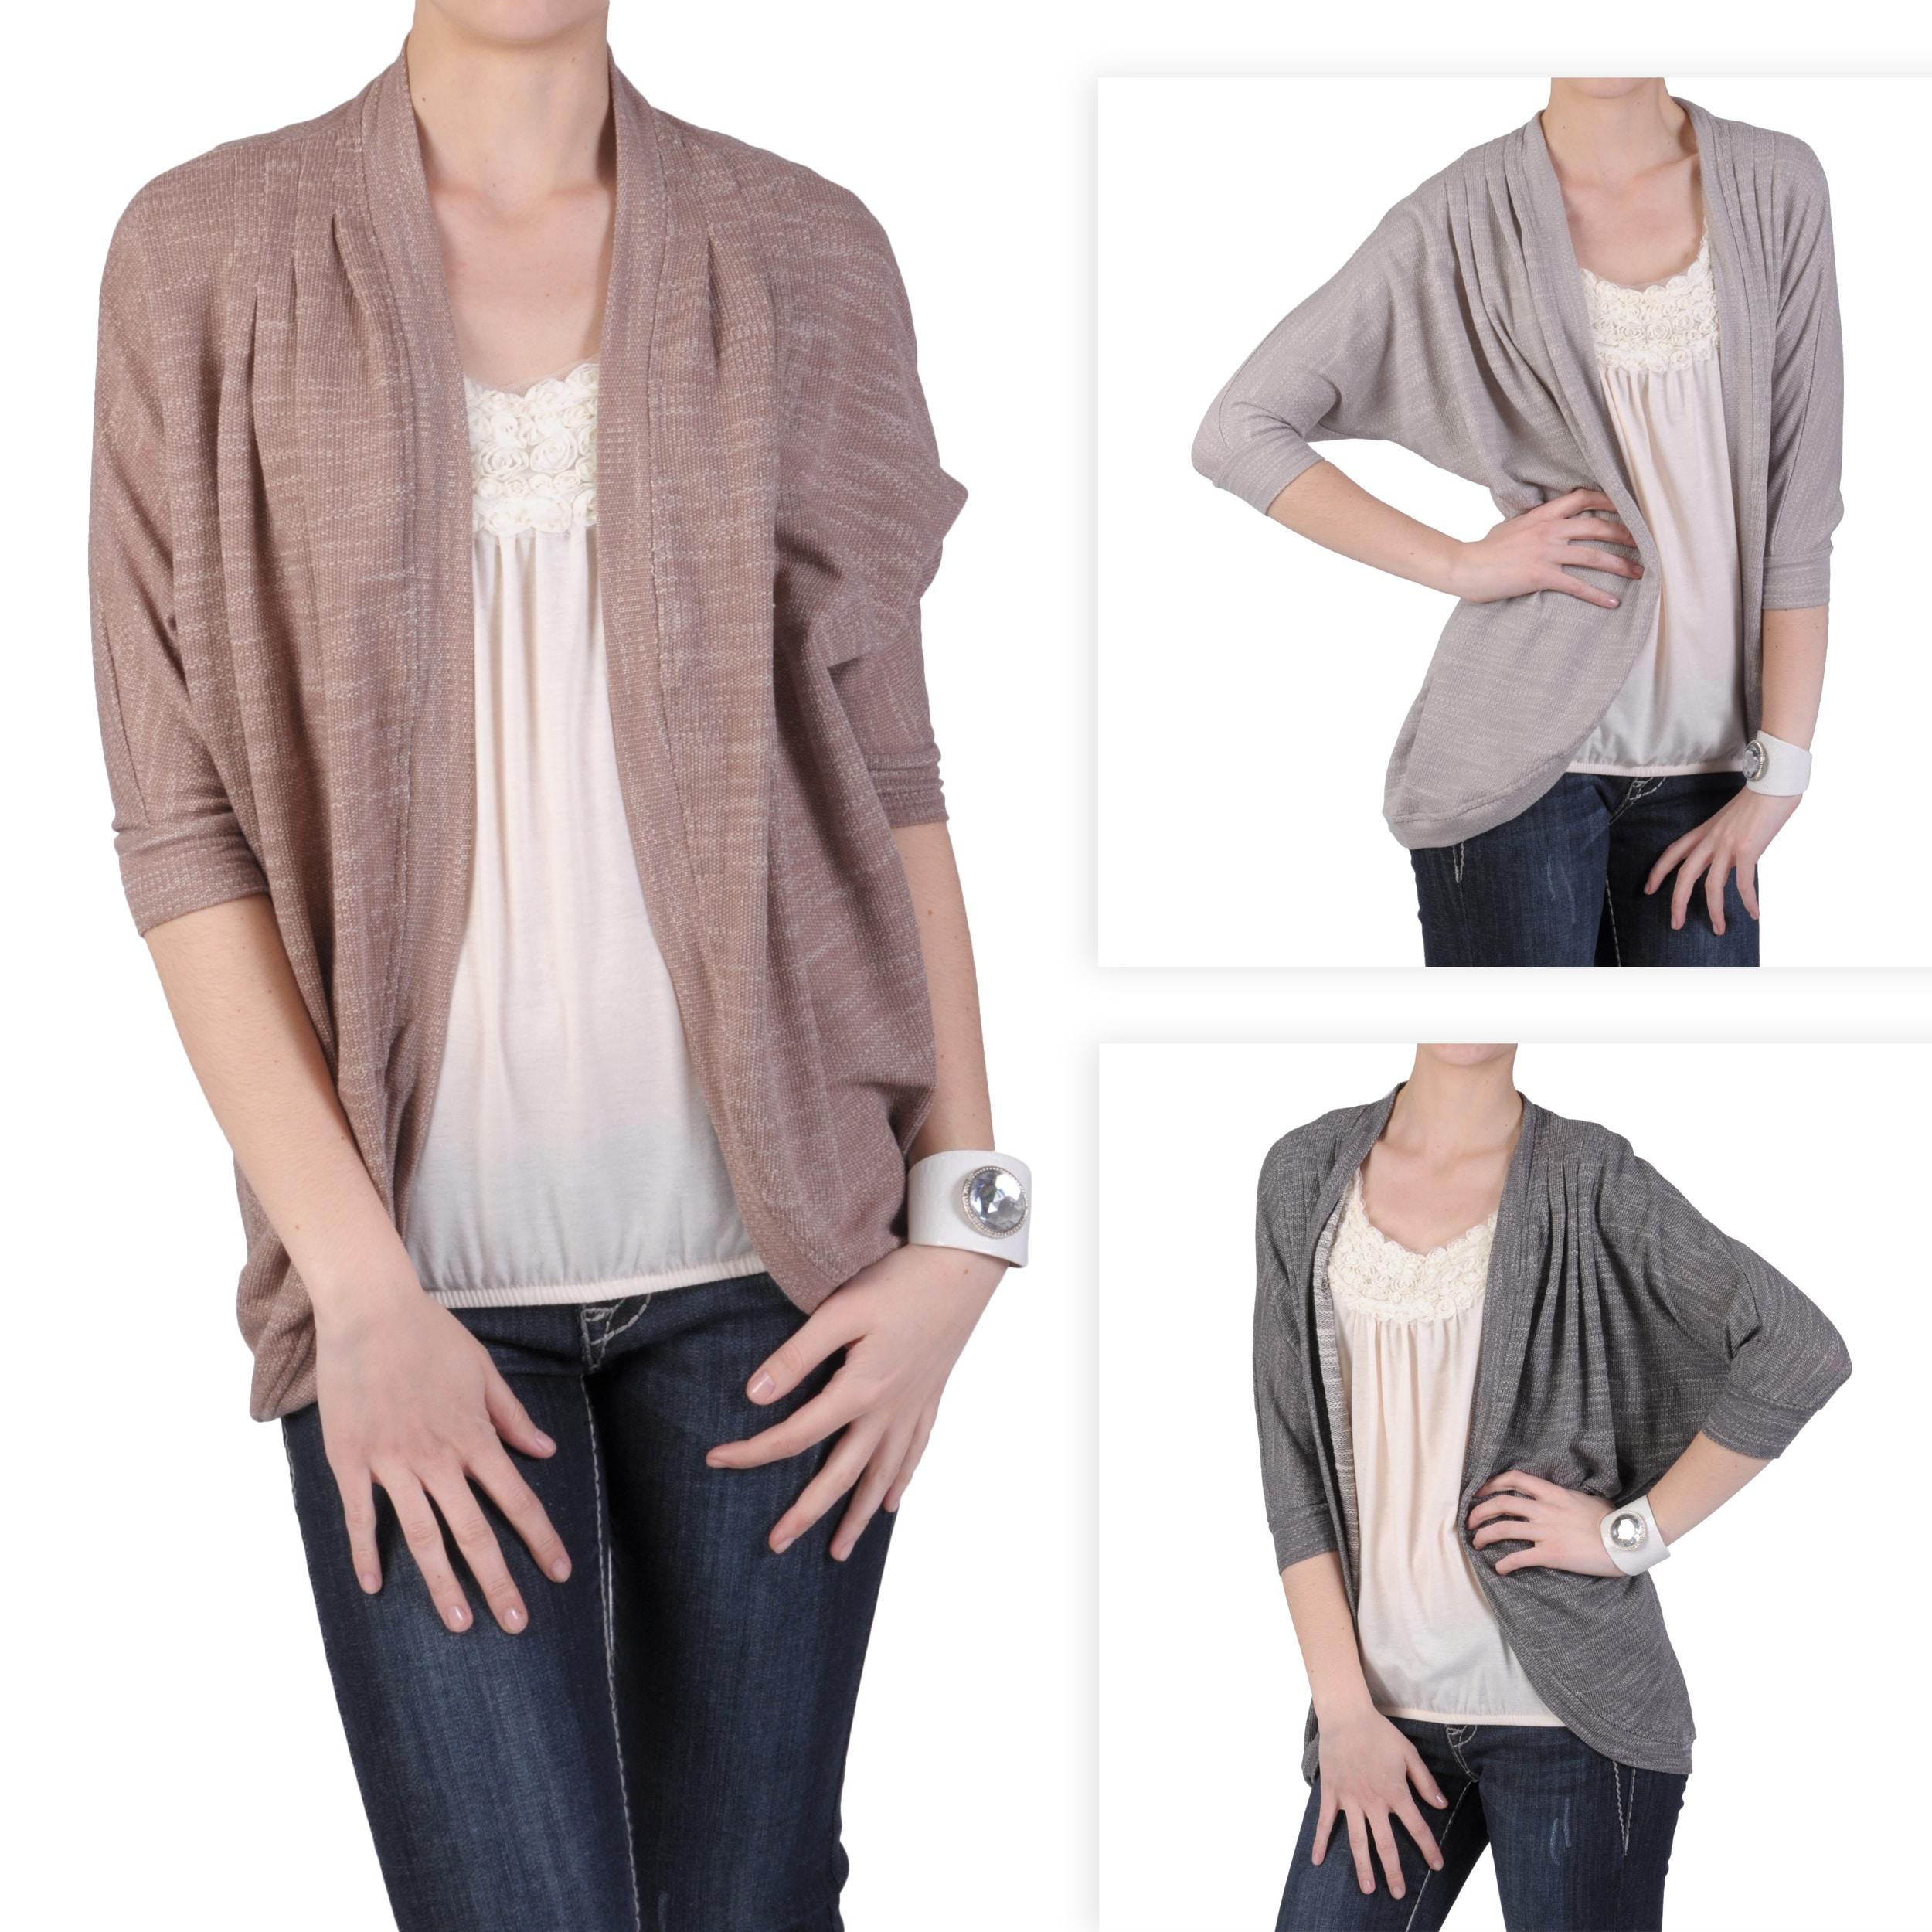 Journee Collection Women's Half-sleeve Open Front Long Cardigan